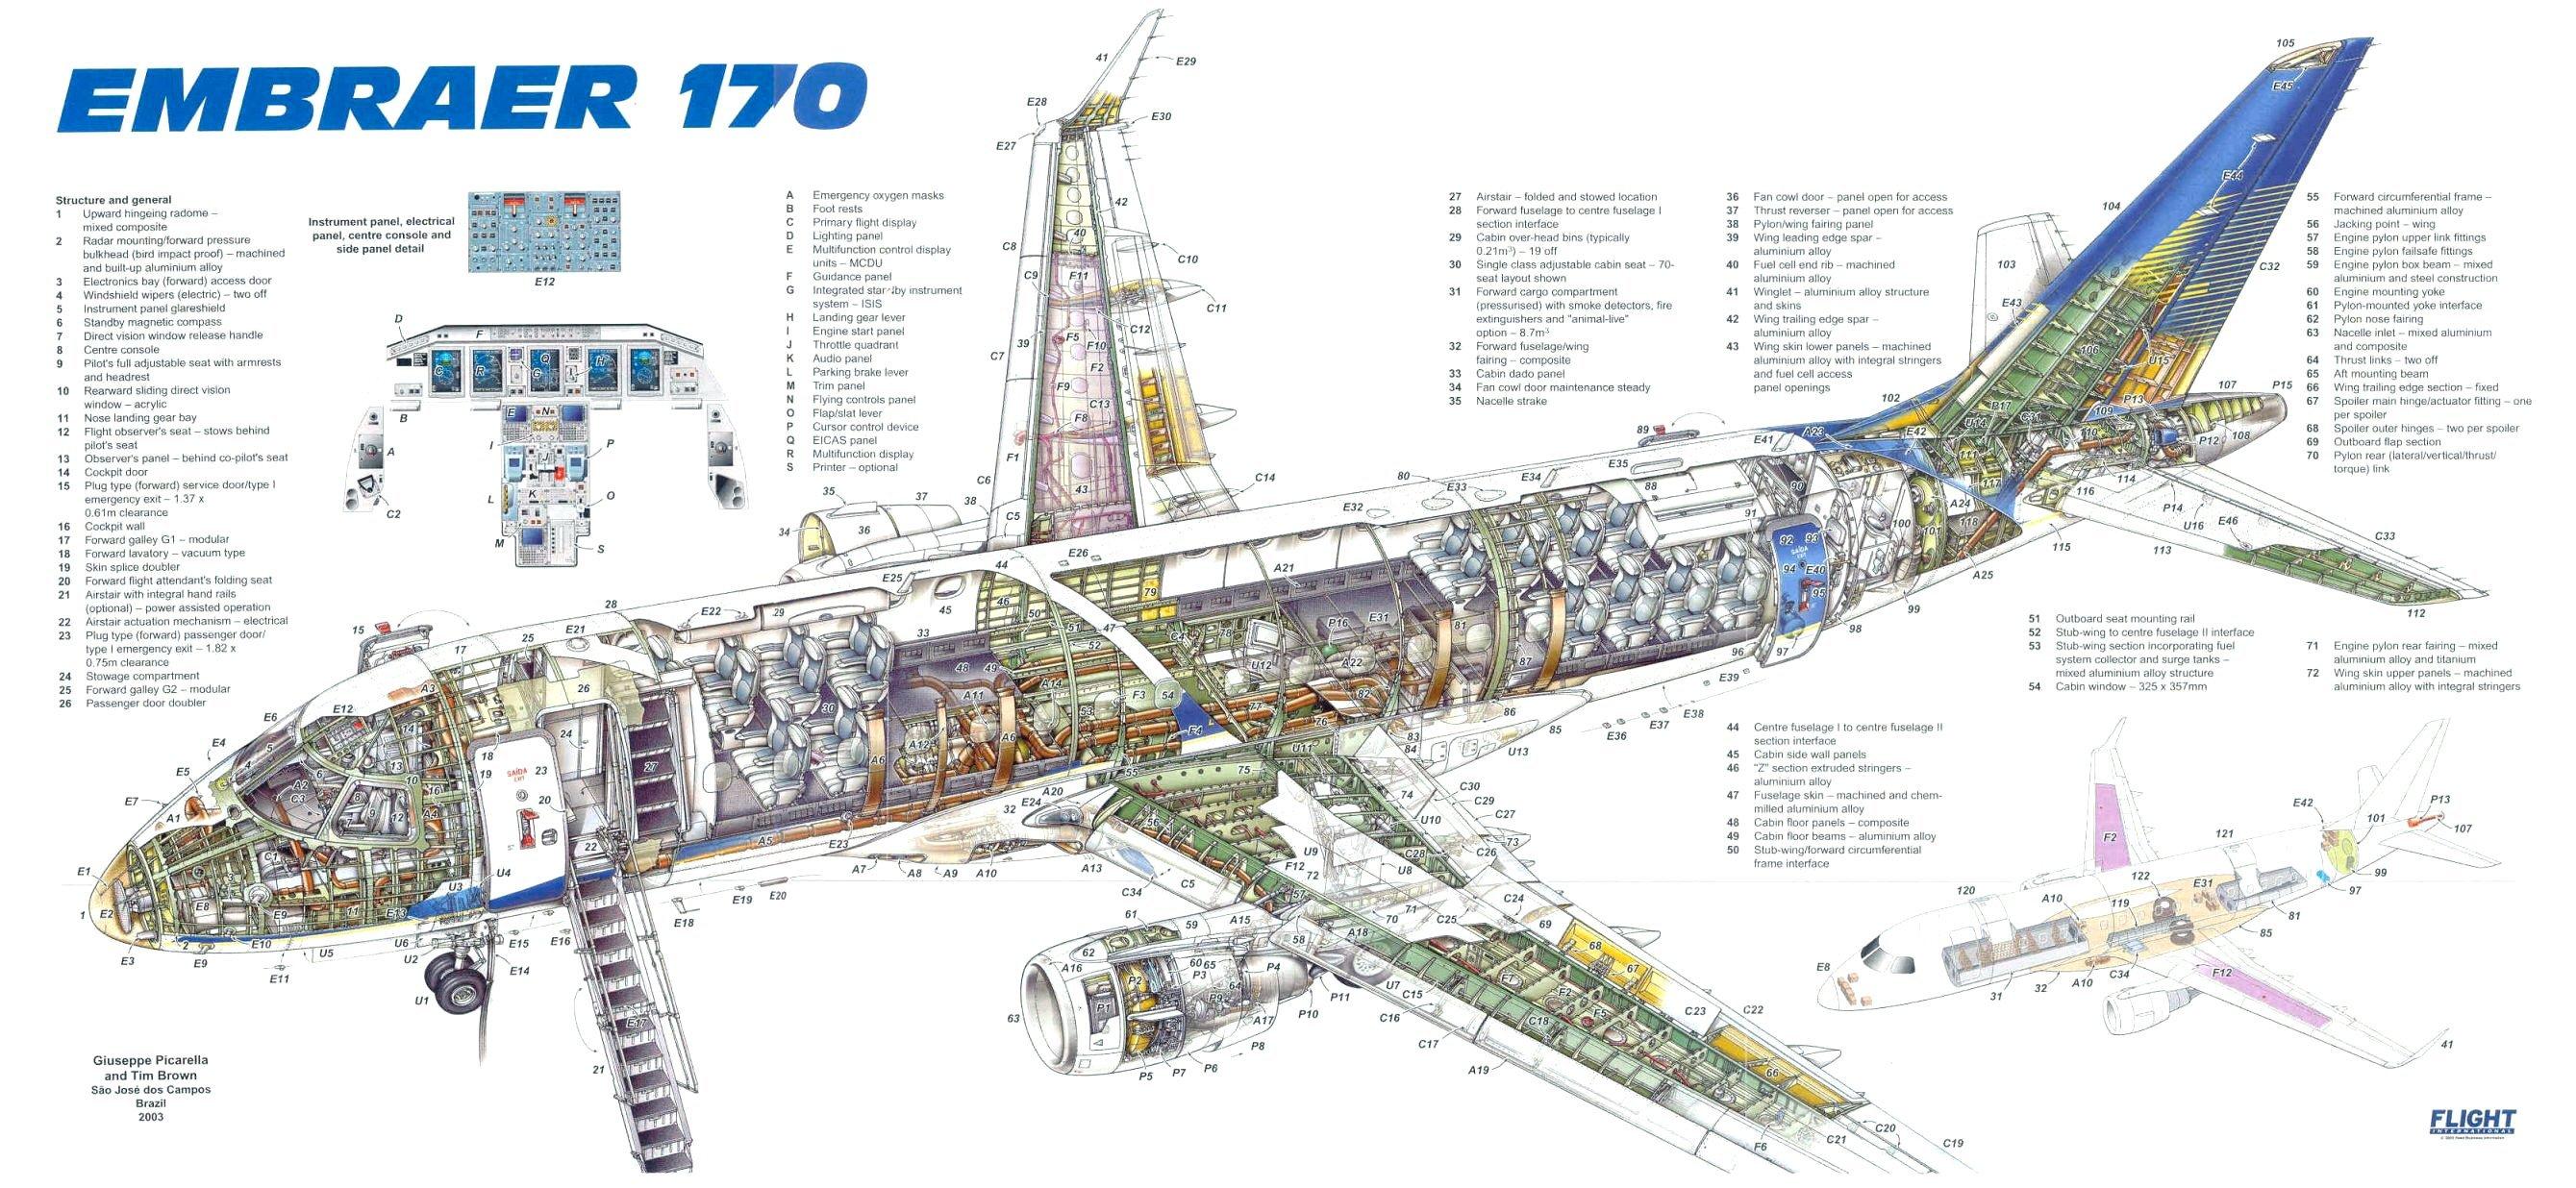 Embraer Airliner Aircraft Airplane Transport Jet Poster